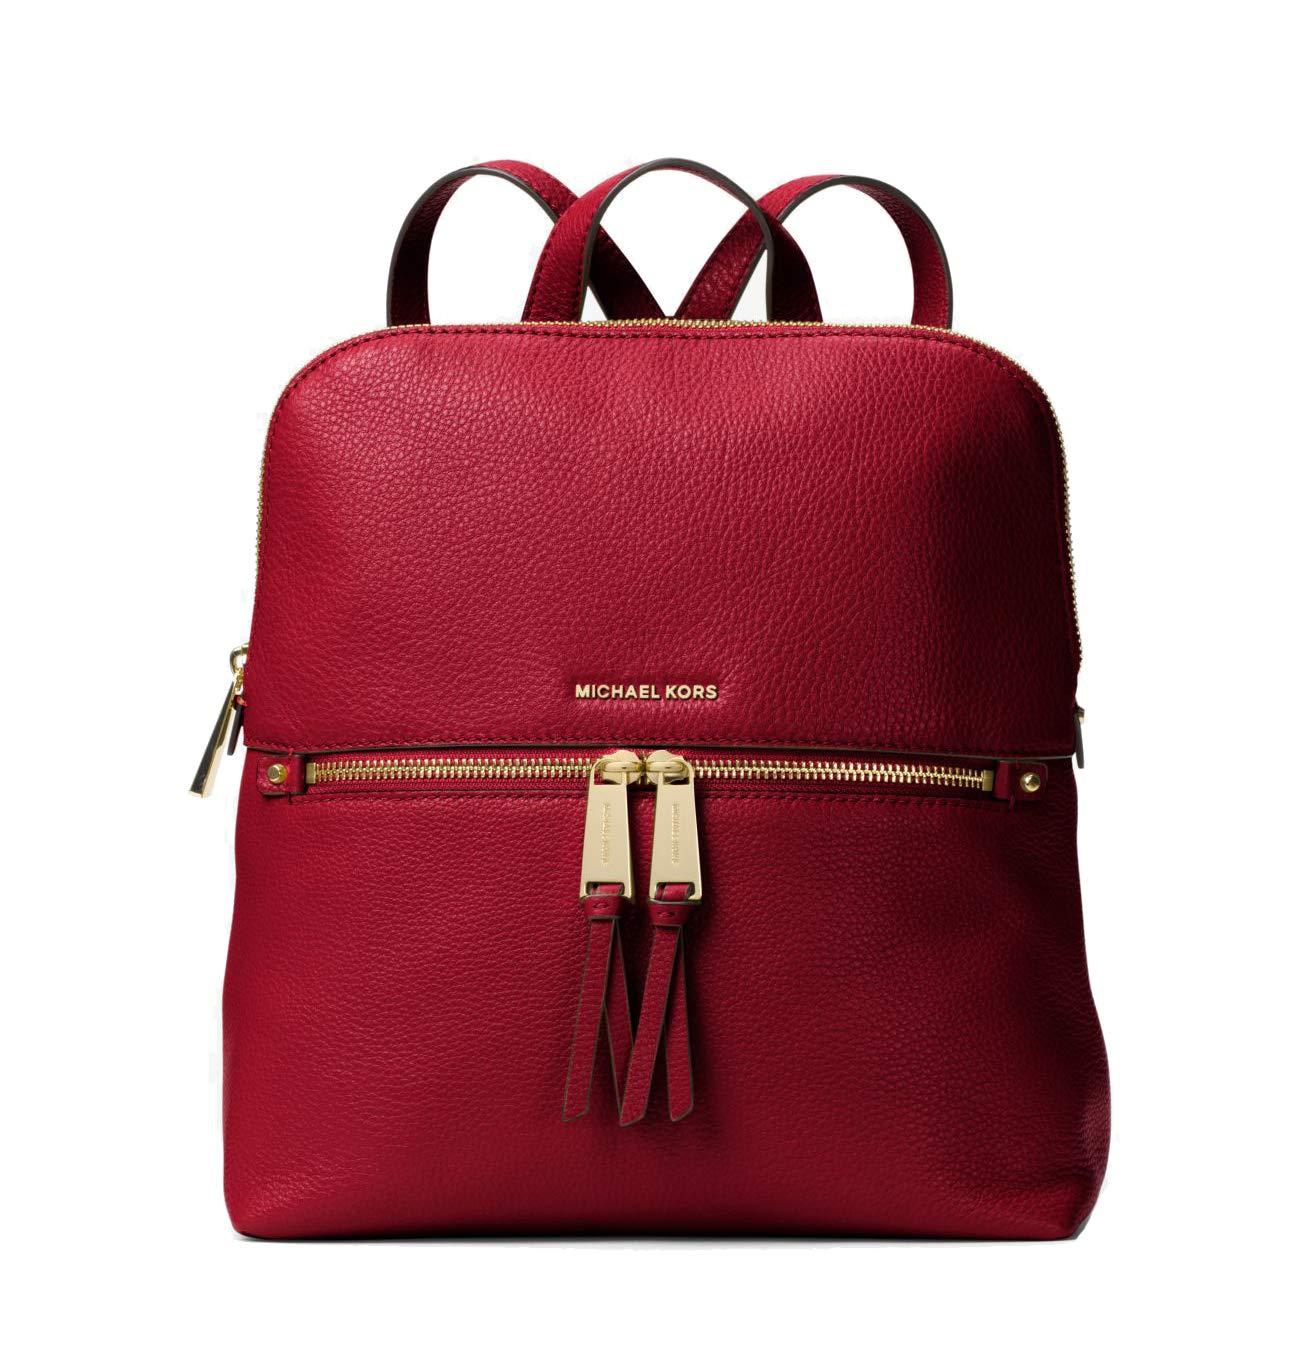 bbd9afd81b96 Galleon - Michael Kors Rhea Medium Slim Leather Backpack MAROON